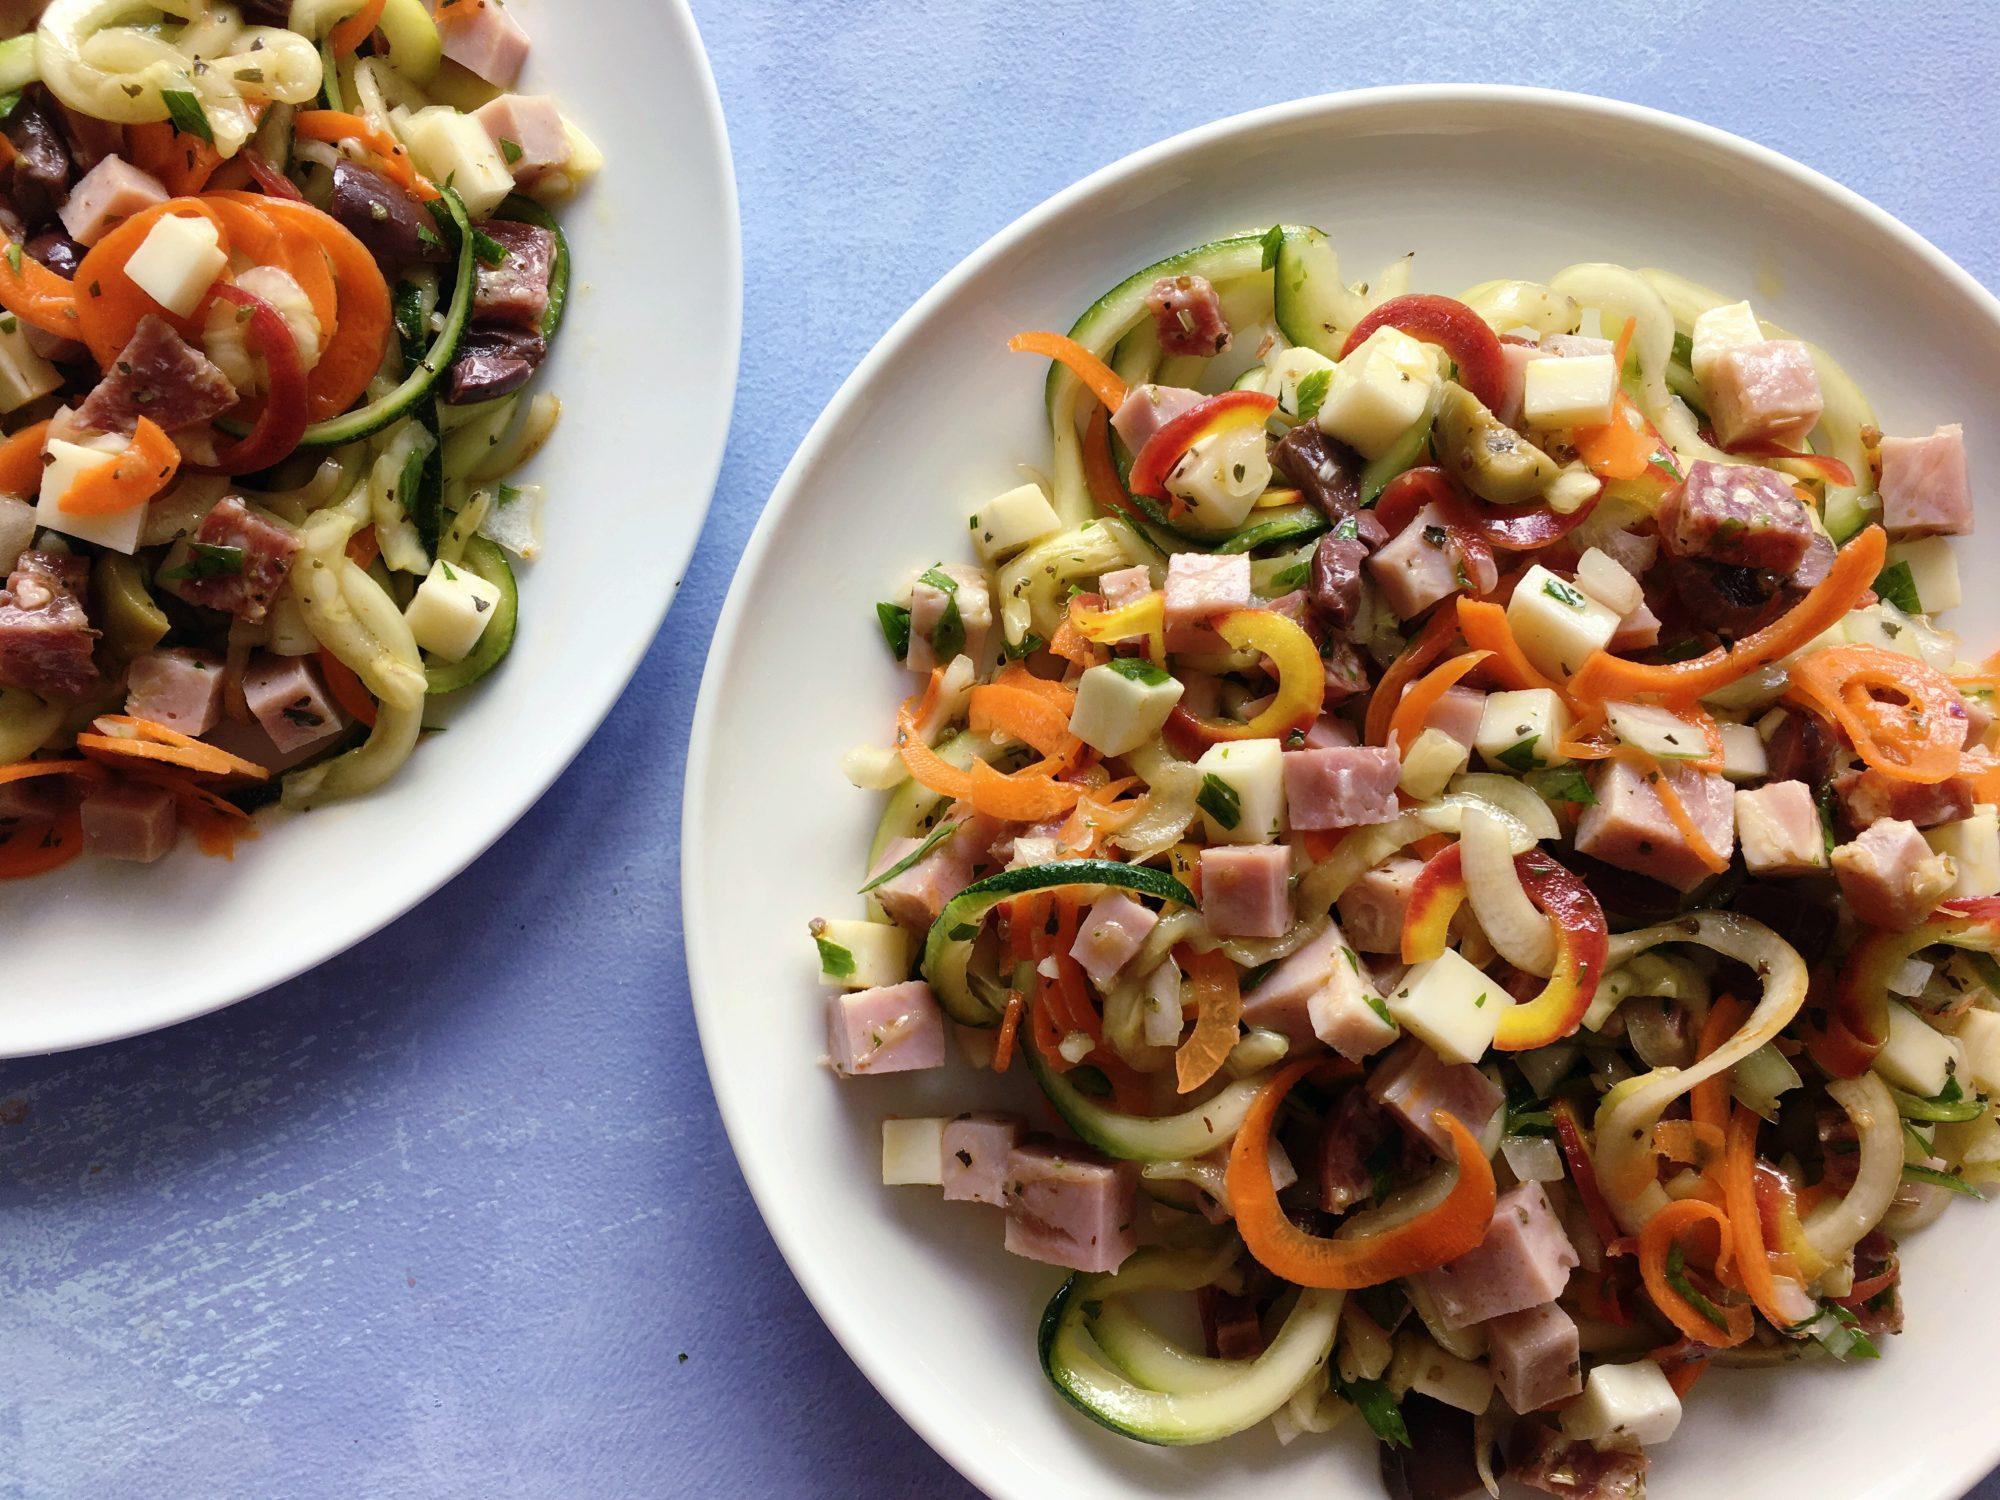 Muffuletta Zucchini and Carrot Noodle Salad